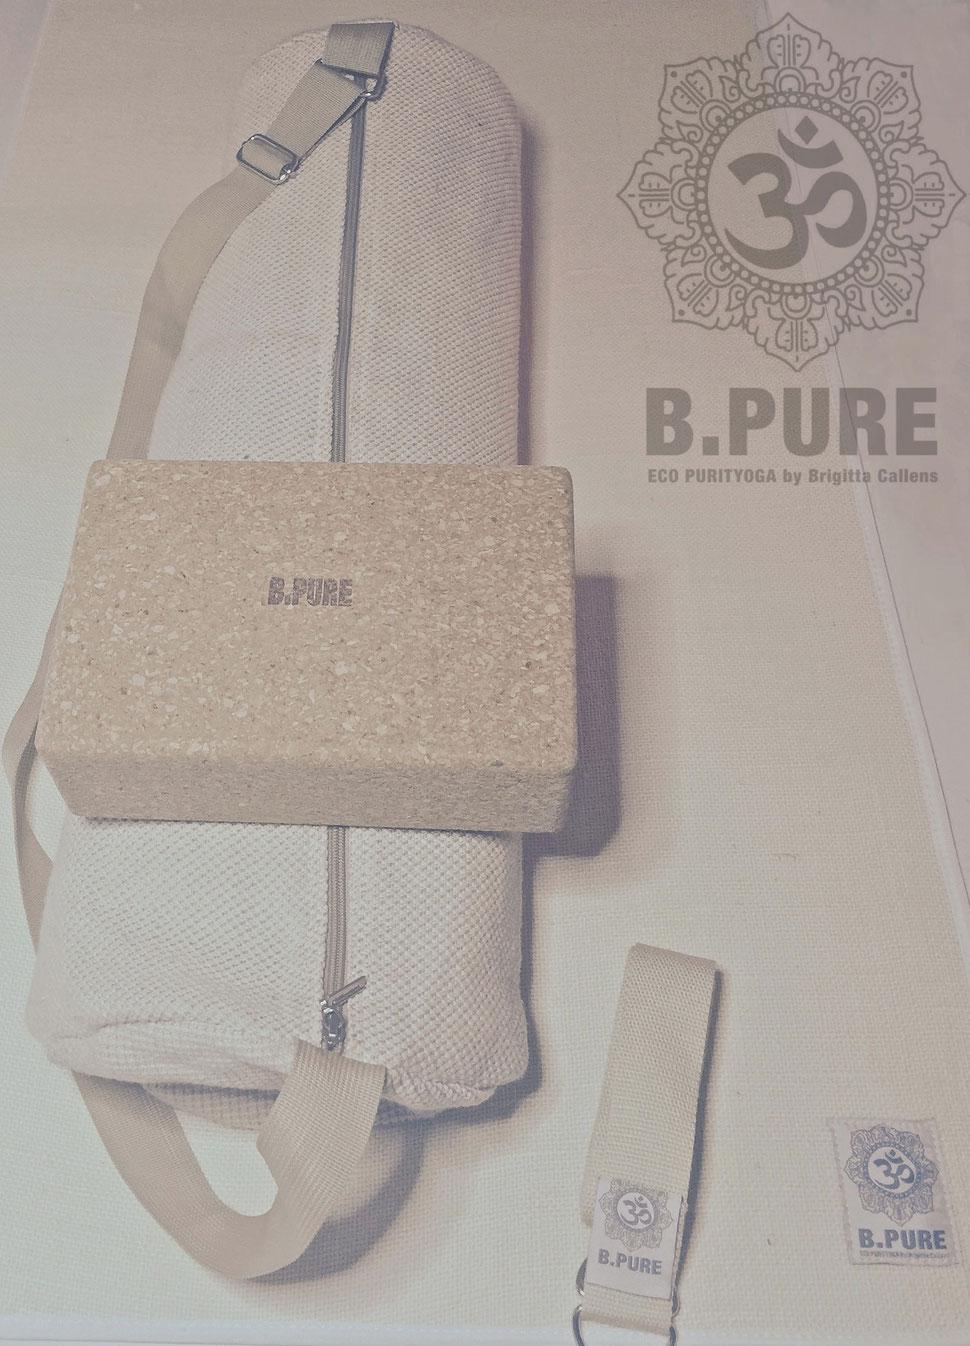 design by Brigitta Callens